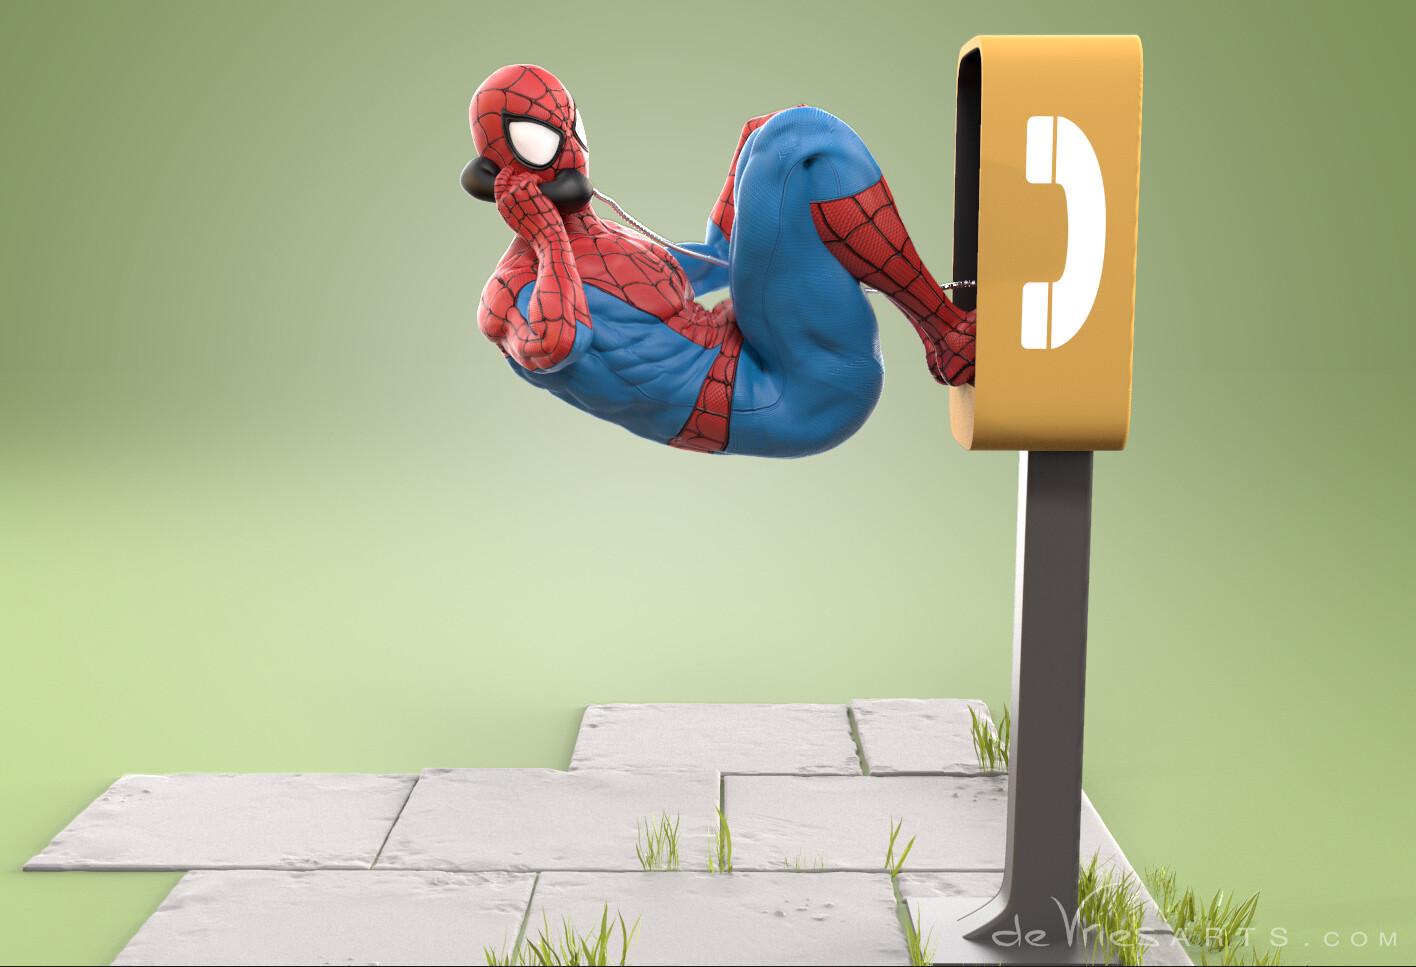 Thijs de vries phonecall2 spiderman thijsdevries devriesarts